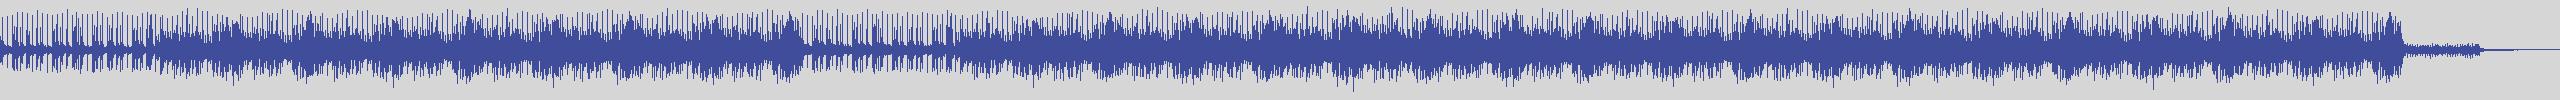 just_digital_records [JS1224] Nikon - Echoes in My Mind [Original Mix] audio wave form